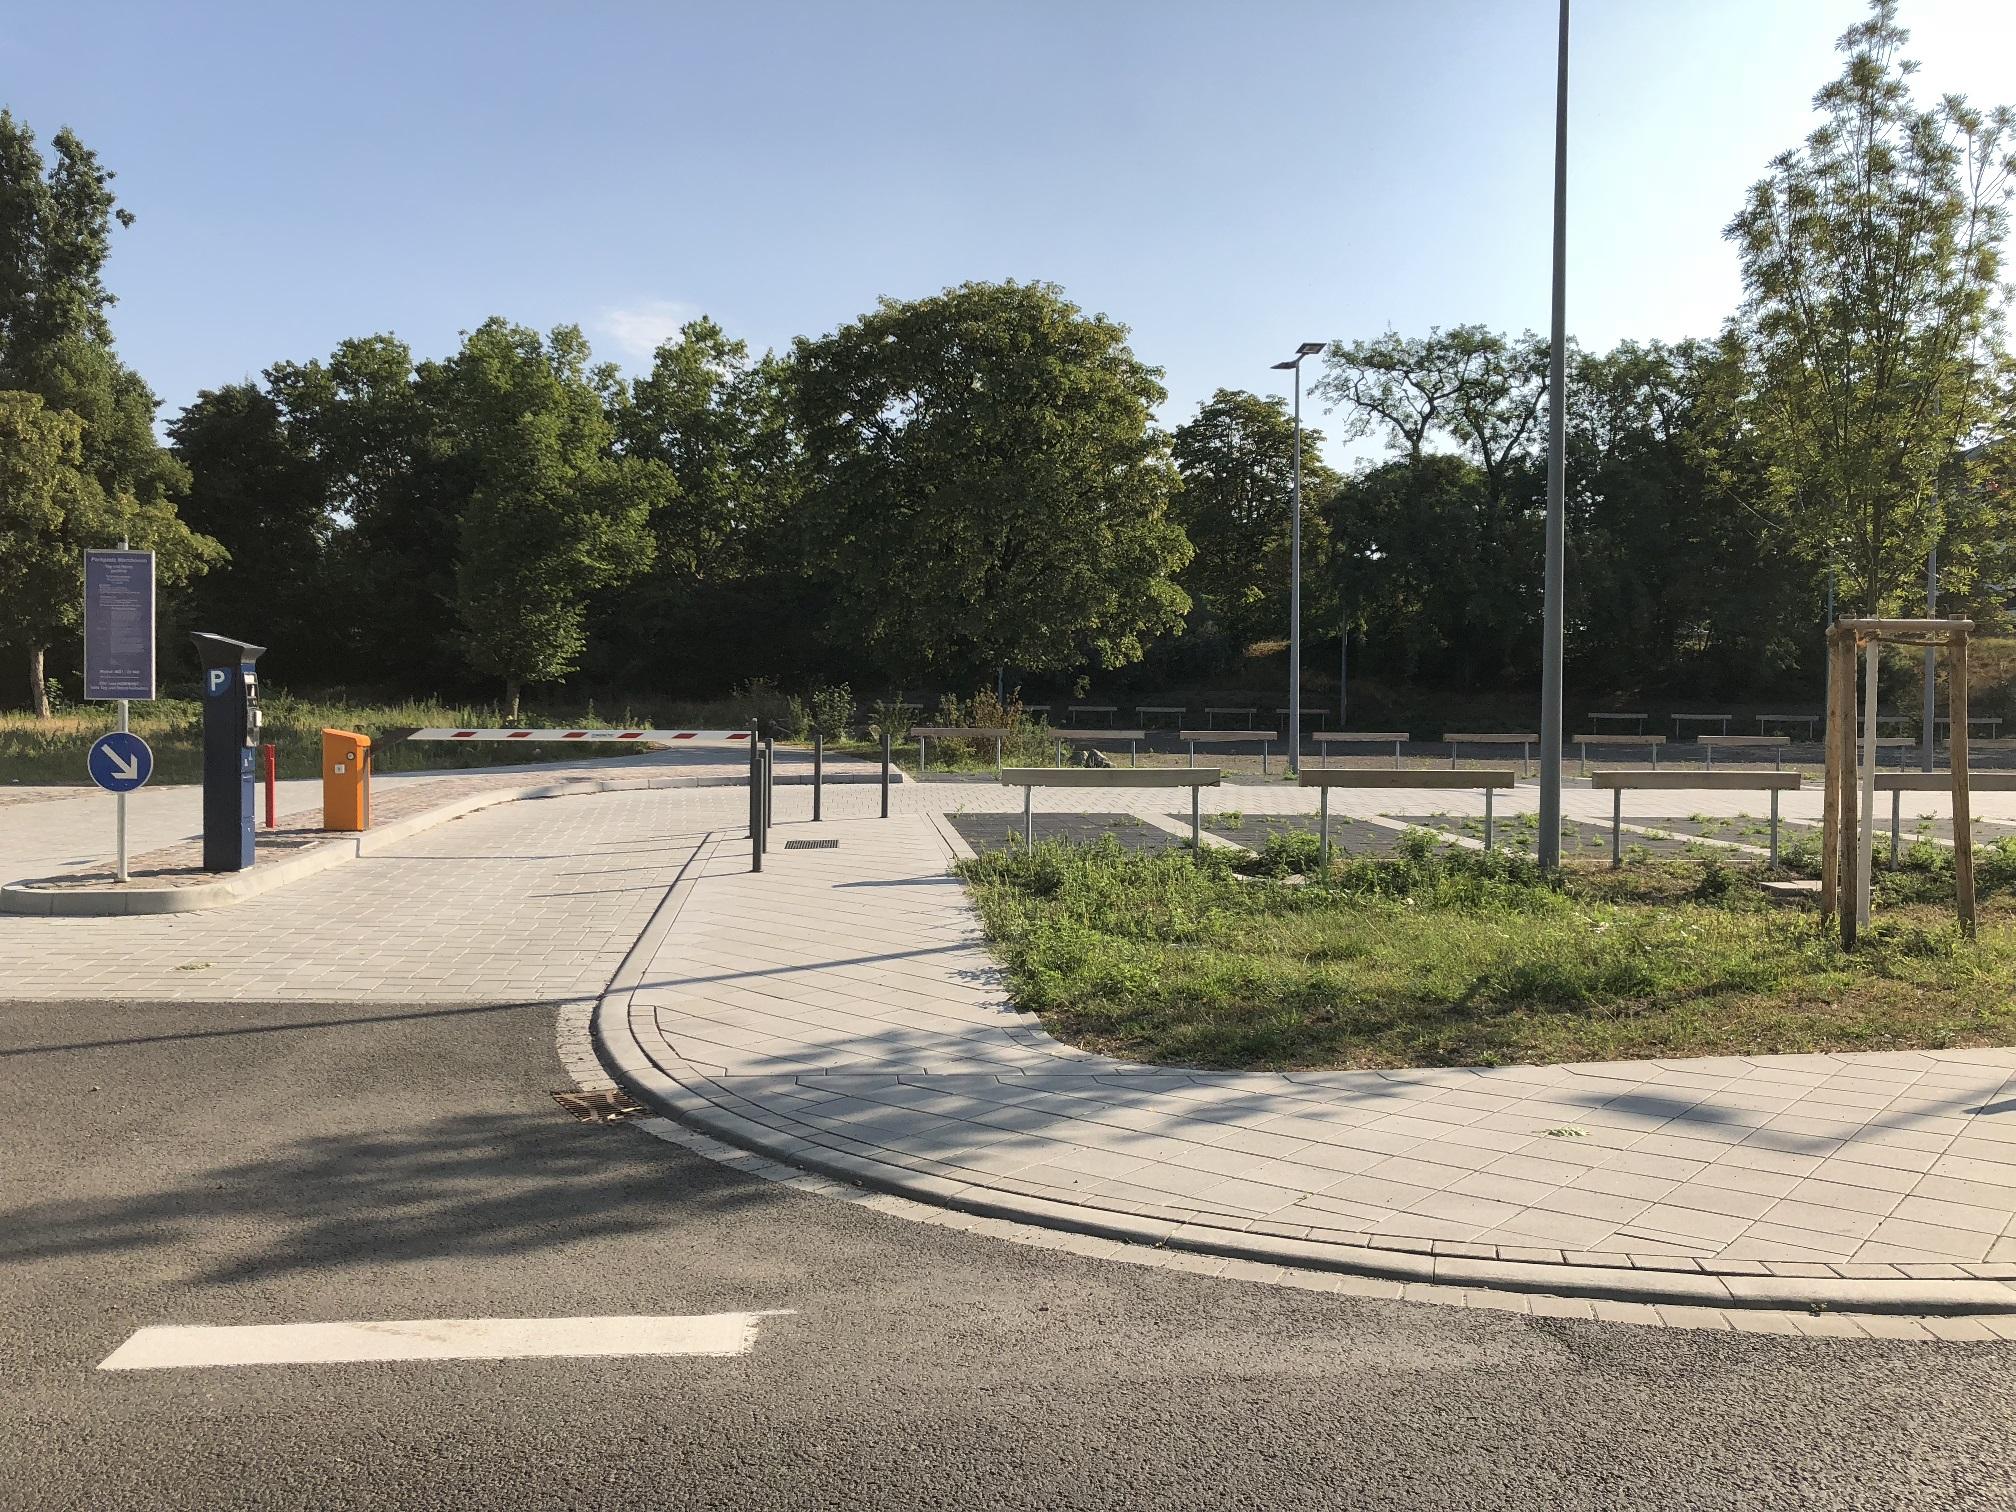 Parkplatz am Musikpark Mannheim